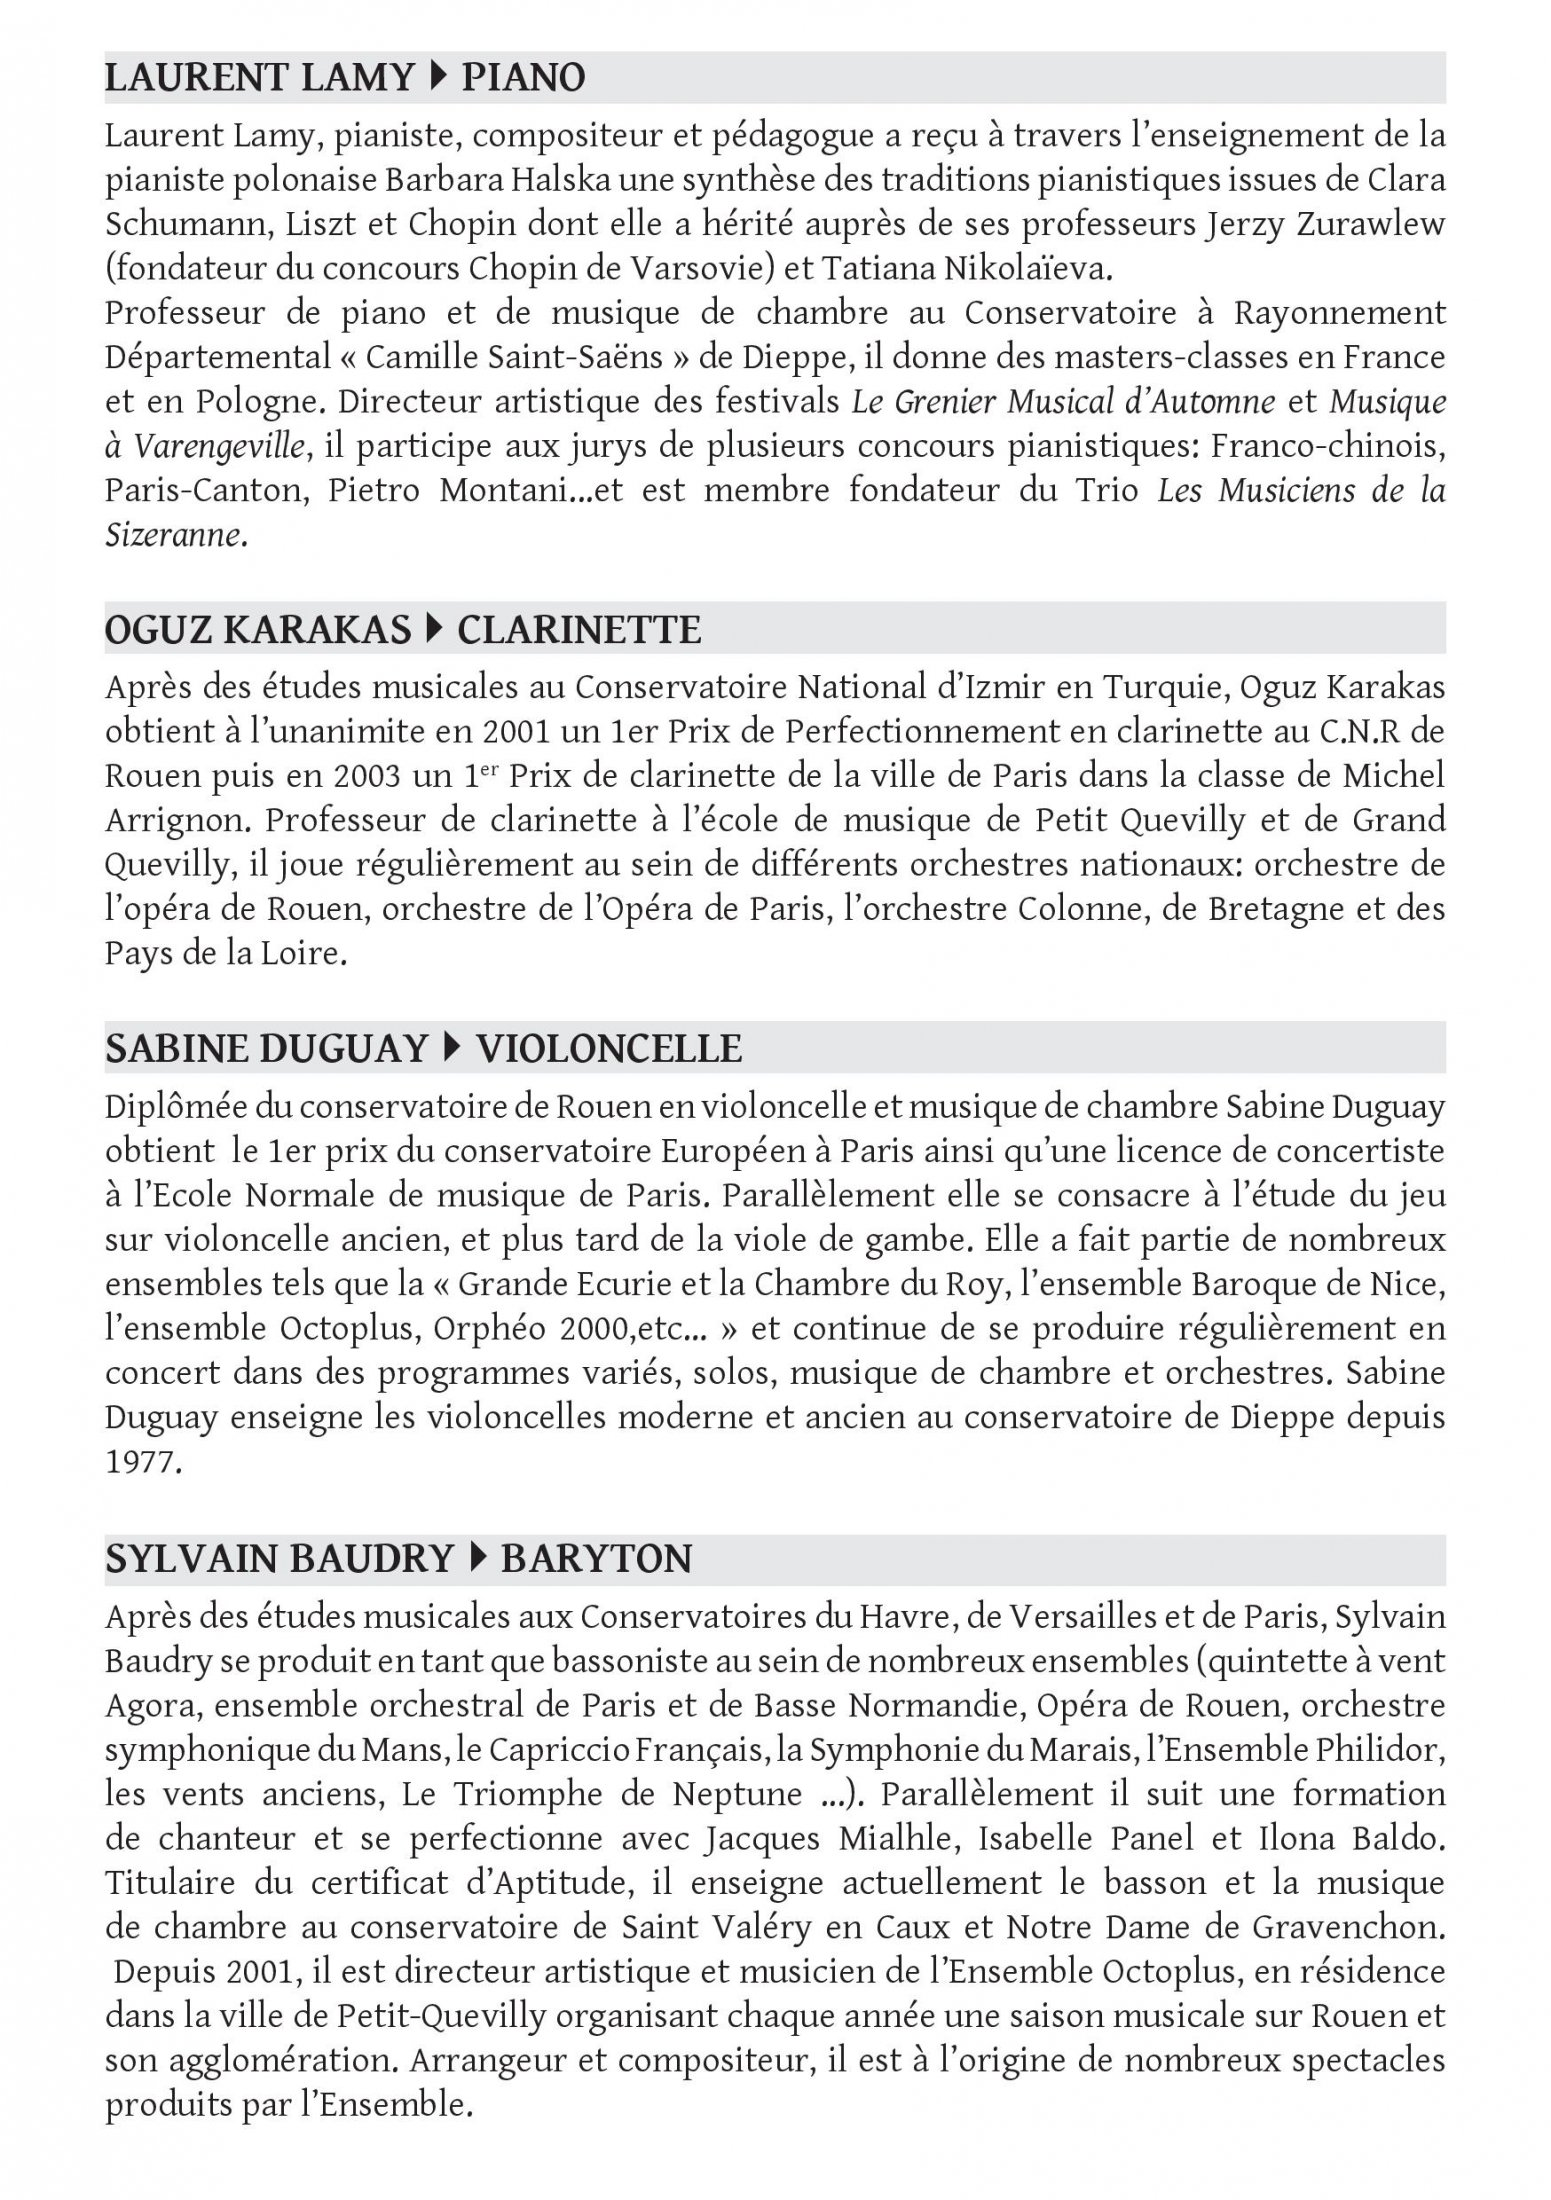 PROGRAMME Avril-page-012